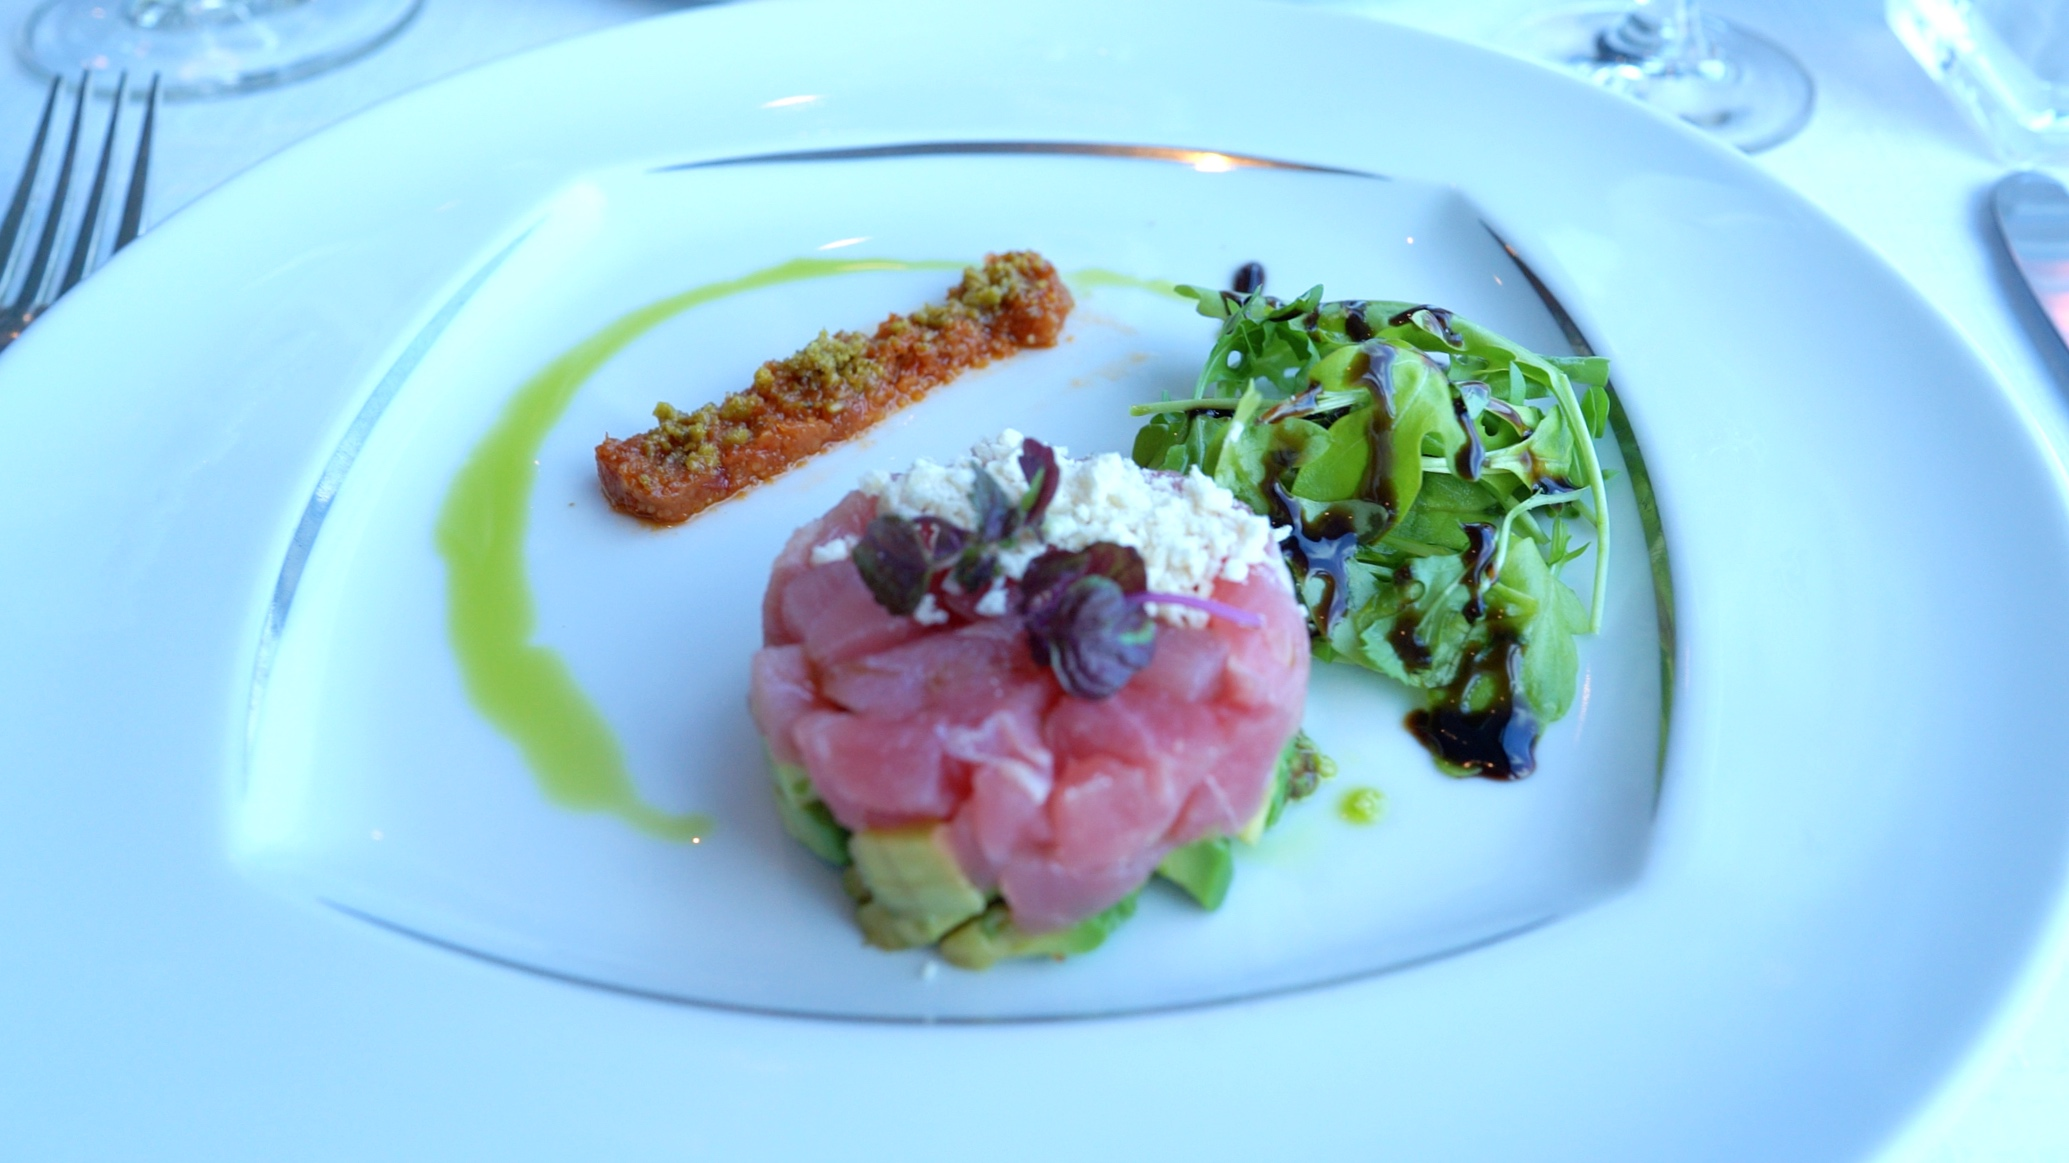 Tuna and avocado starter